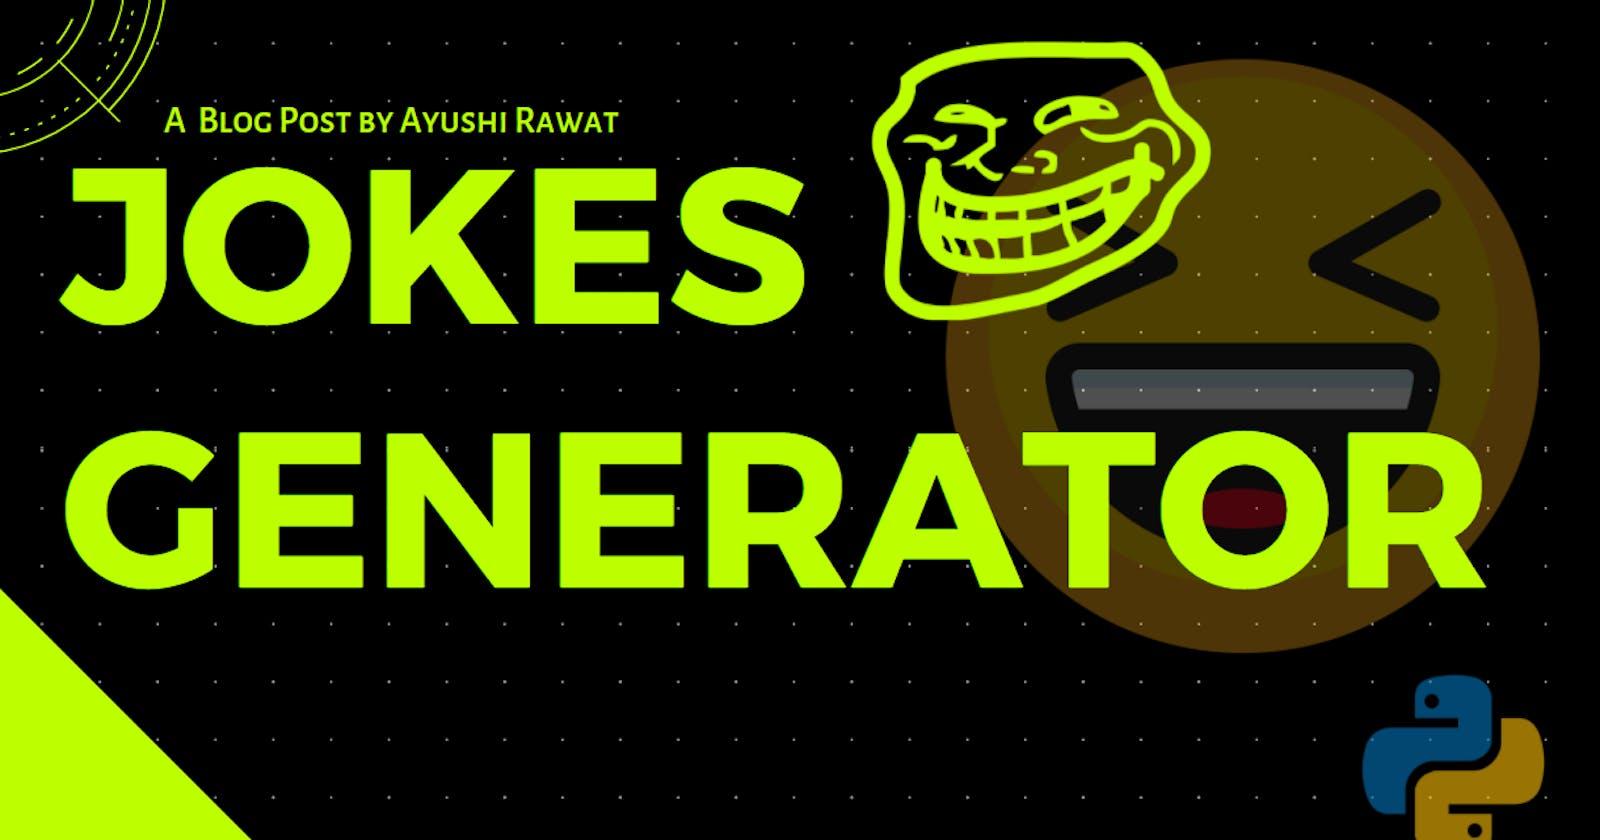 Jokes Generator with python